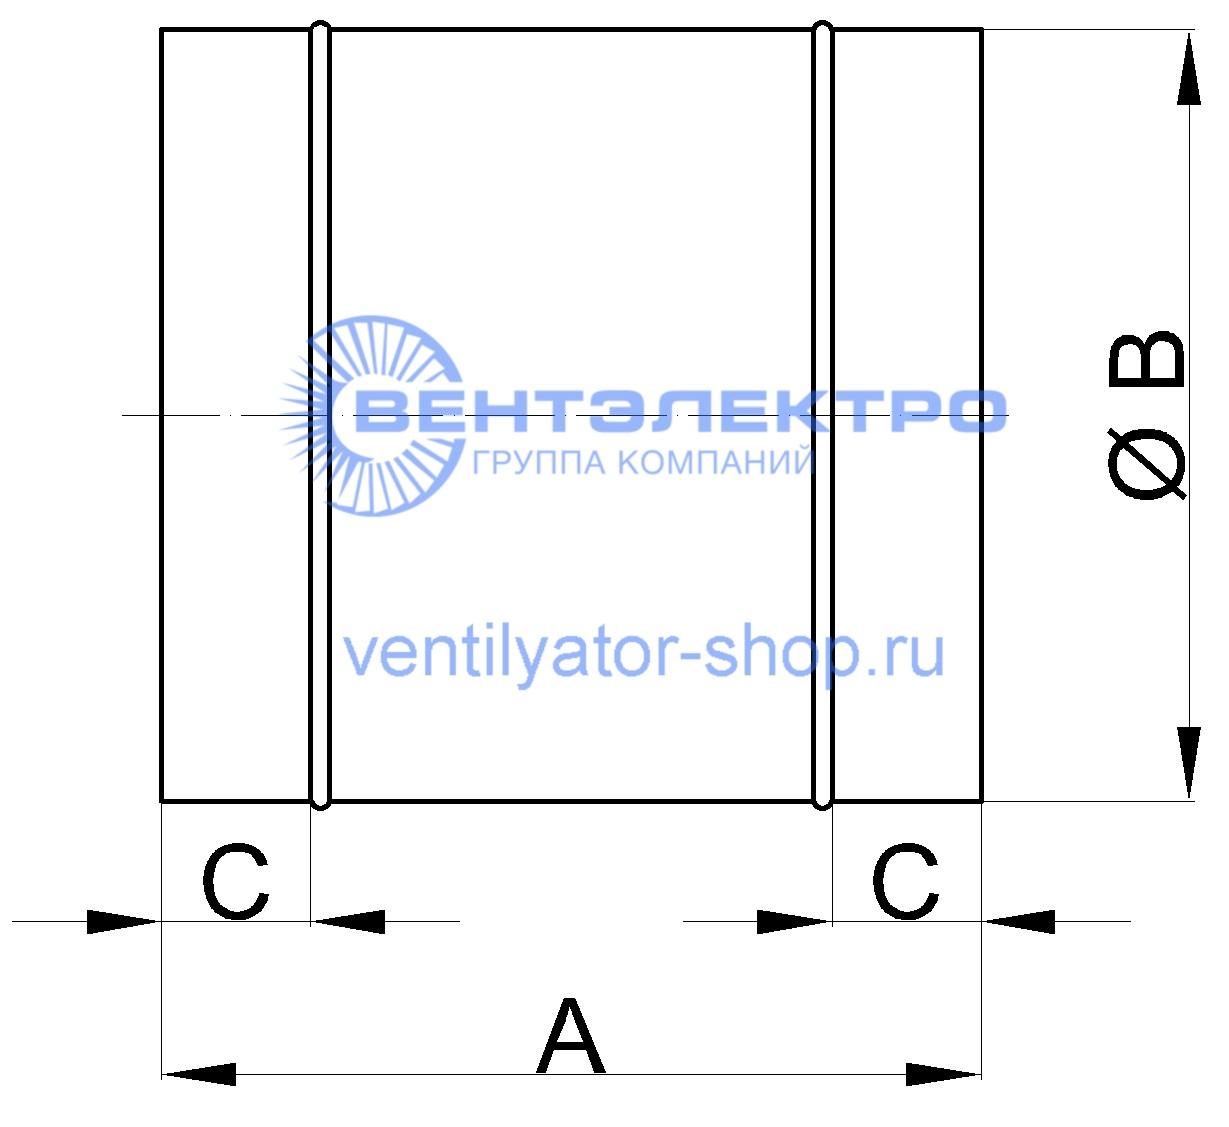 Вентилятор ВКО аналог Домовент, Вентс, Vents